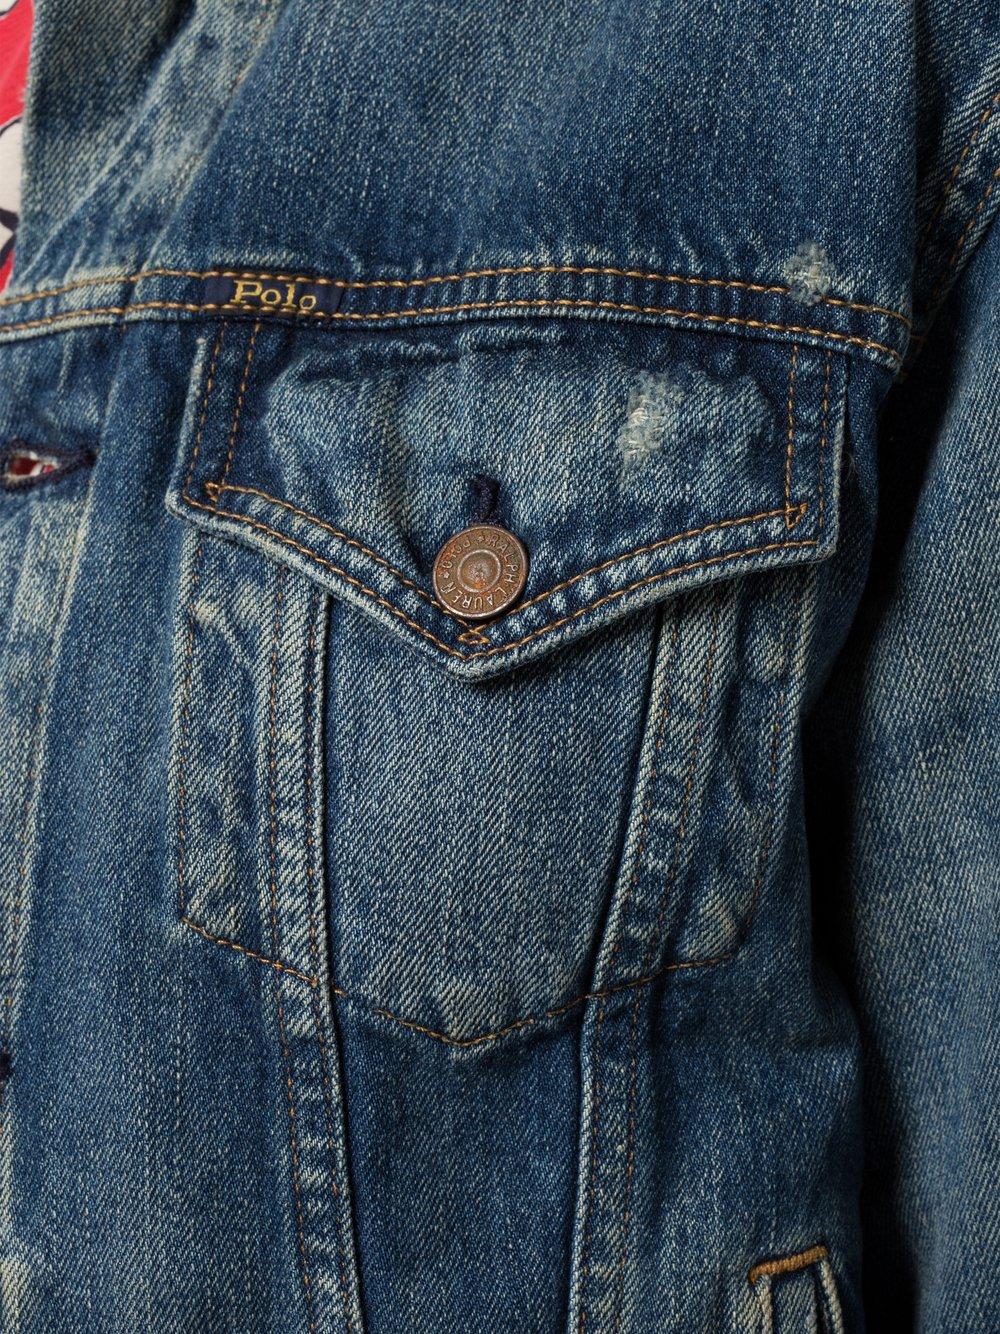 Polo Ralph Lauren Damen Jeansjacke  2  online kaufen   PEEK-UND ... 47d5d6816f